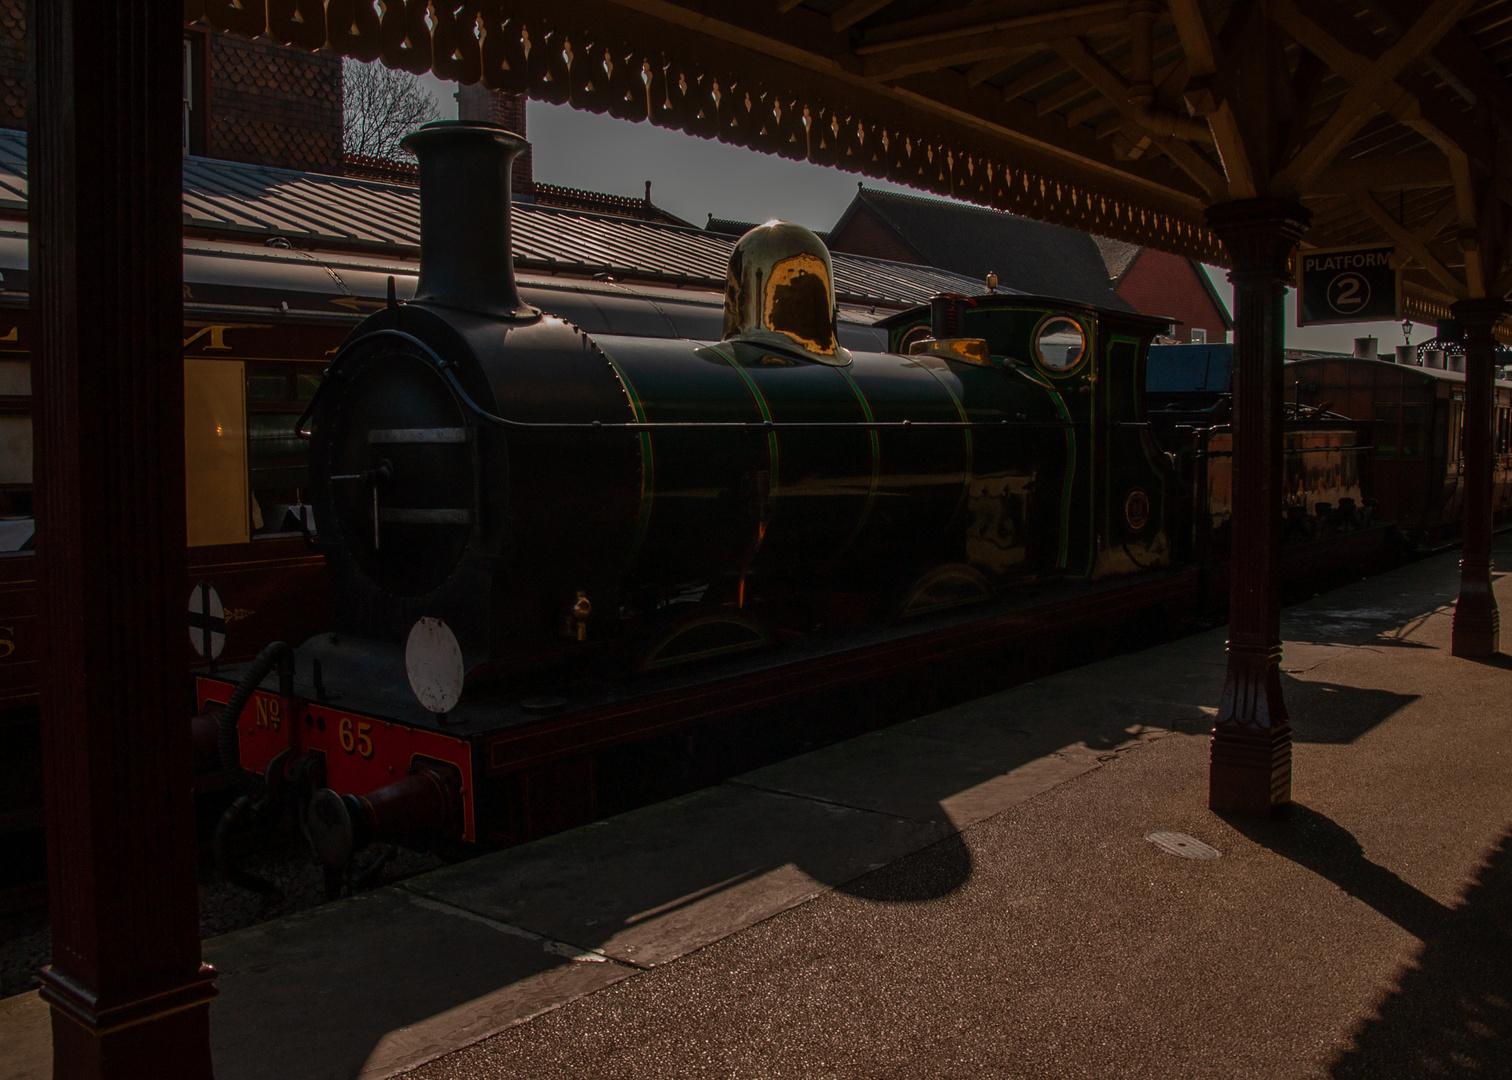 Locomotive in Strong Summer Sunlight.